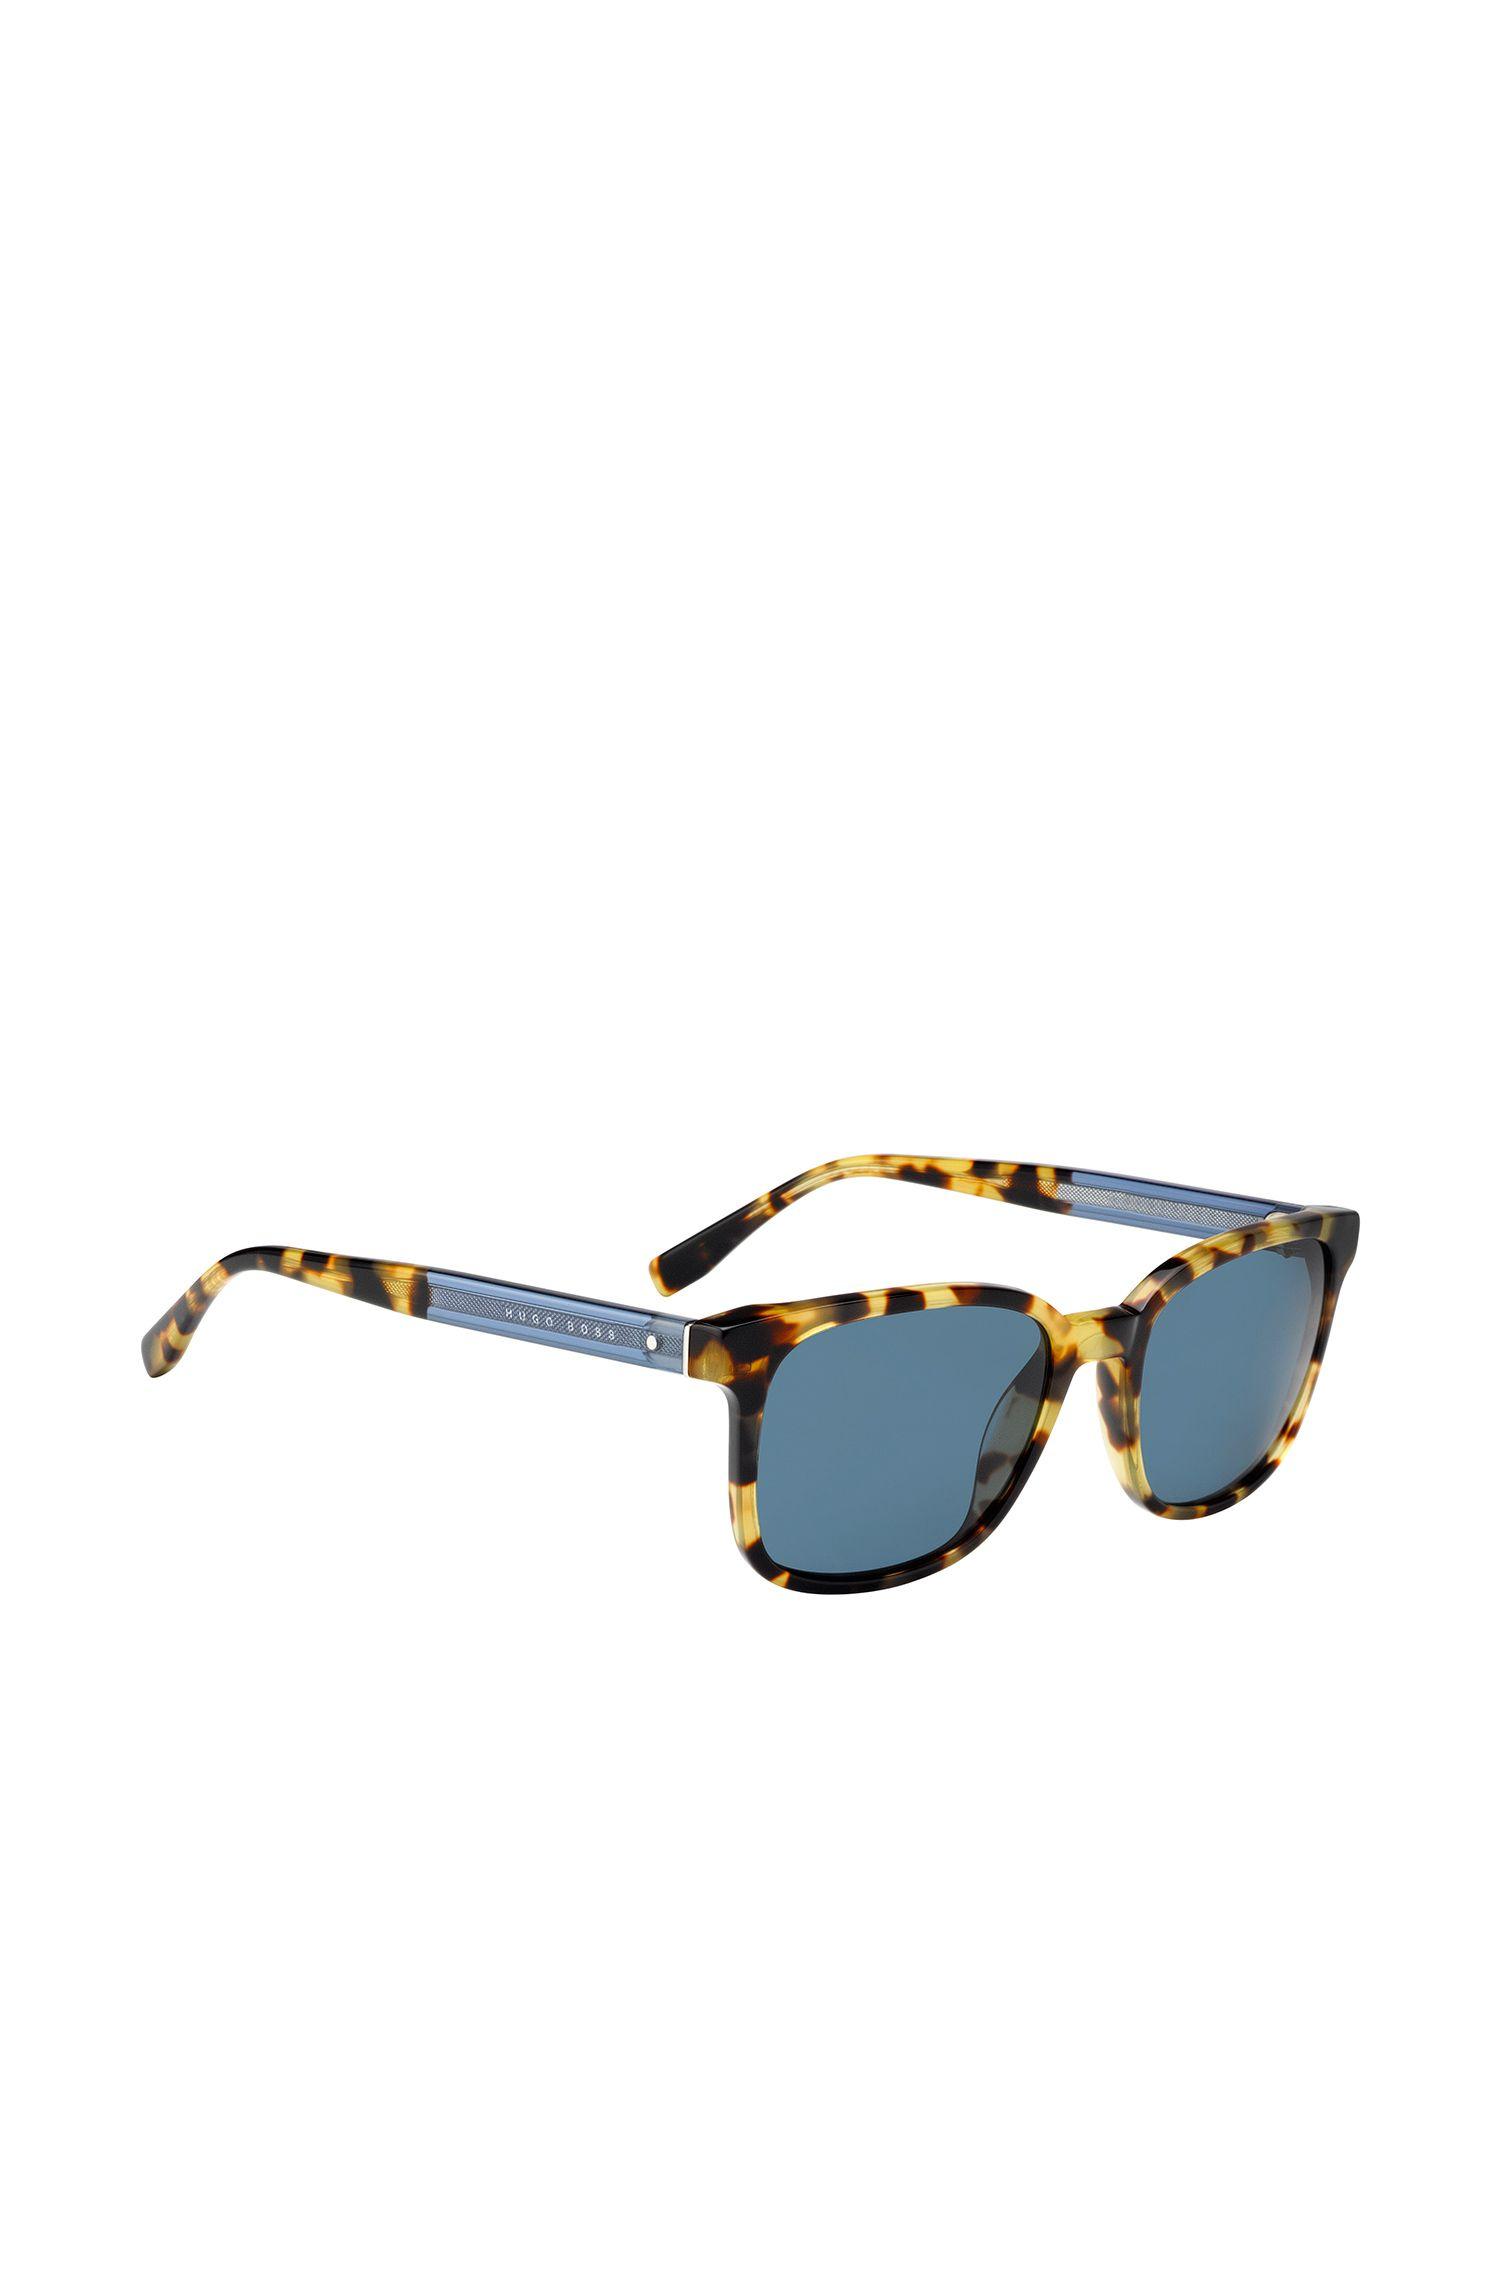 'BOSS 0802S' | Blue Lens Square Sunglasses